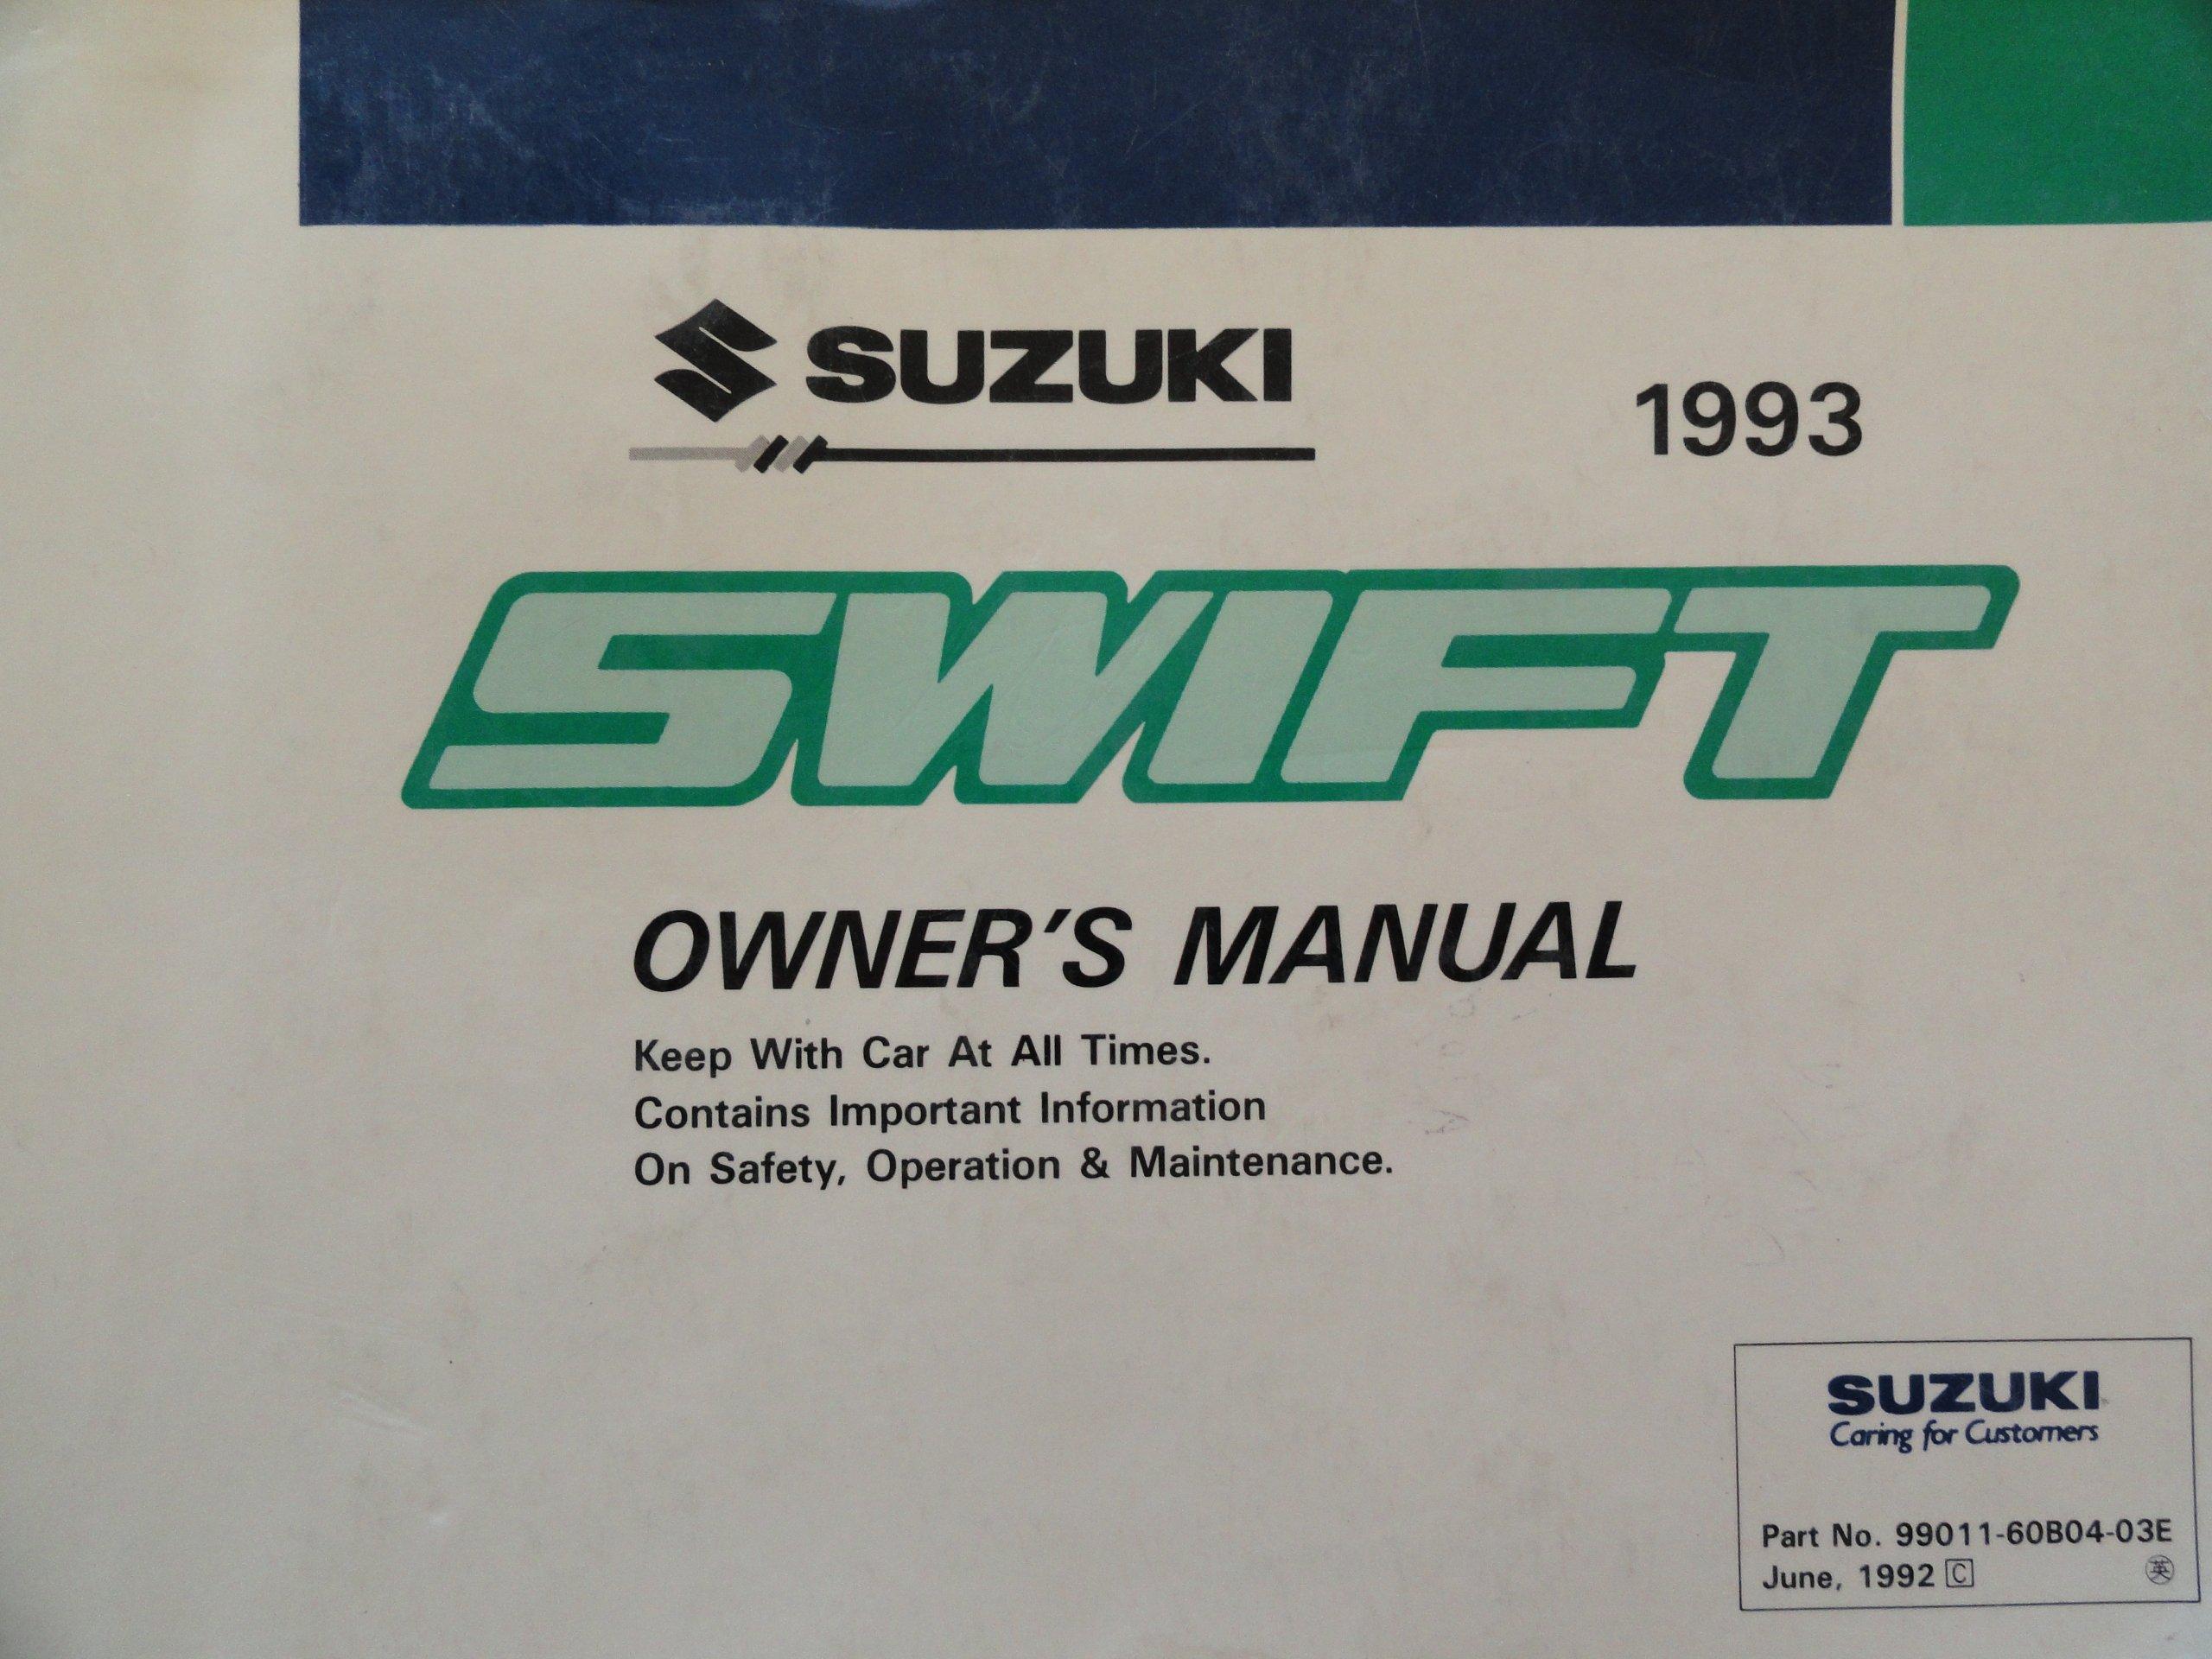 original 1993 suzuki swift owners manual suzuki amazon com books rh amazon com 1990 Suzuki Swift 1990 Suzuki Swift